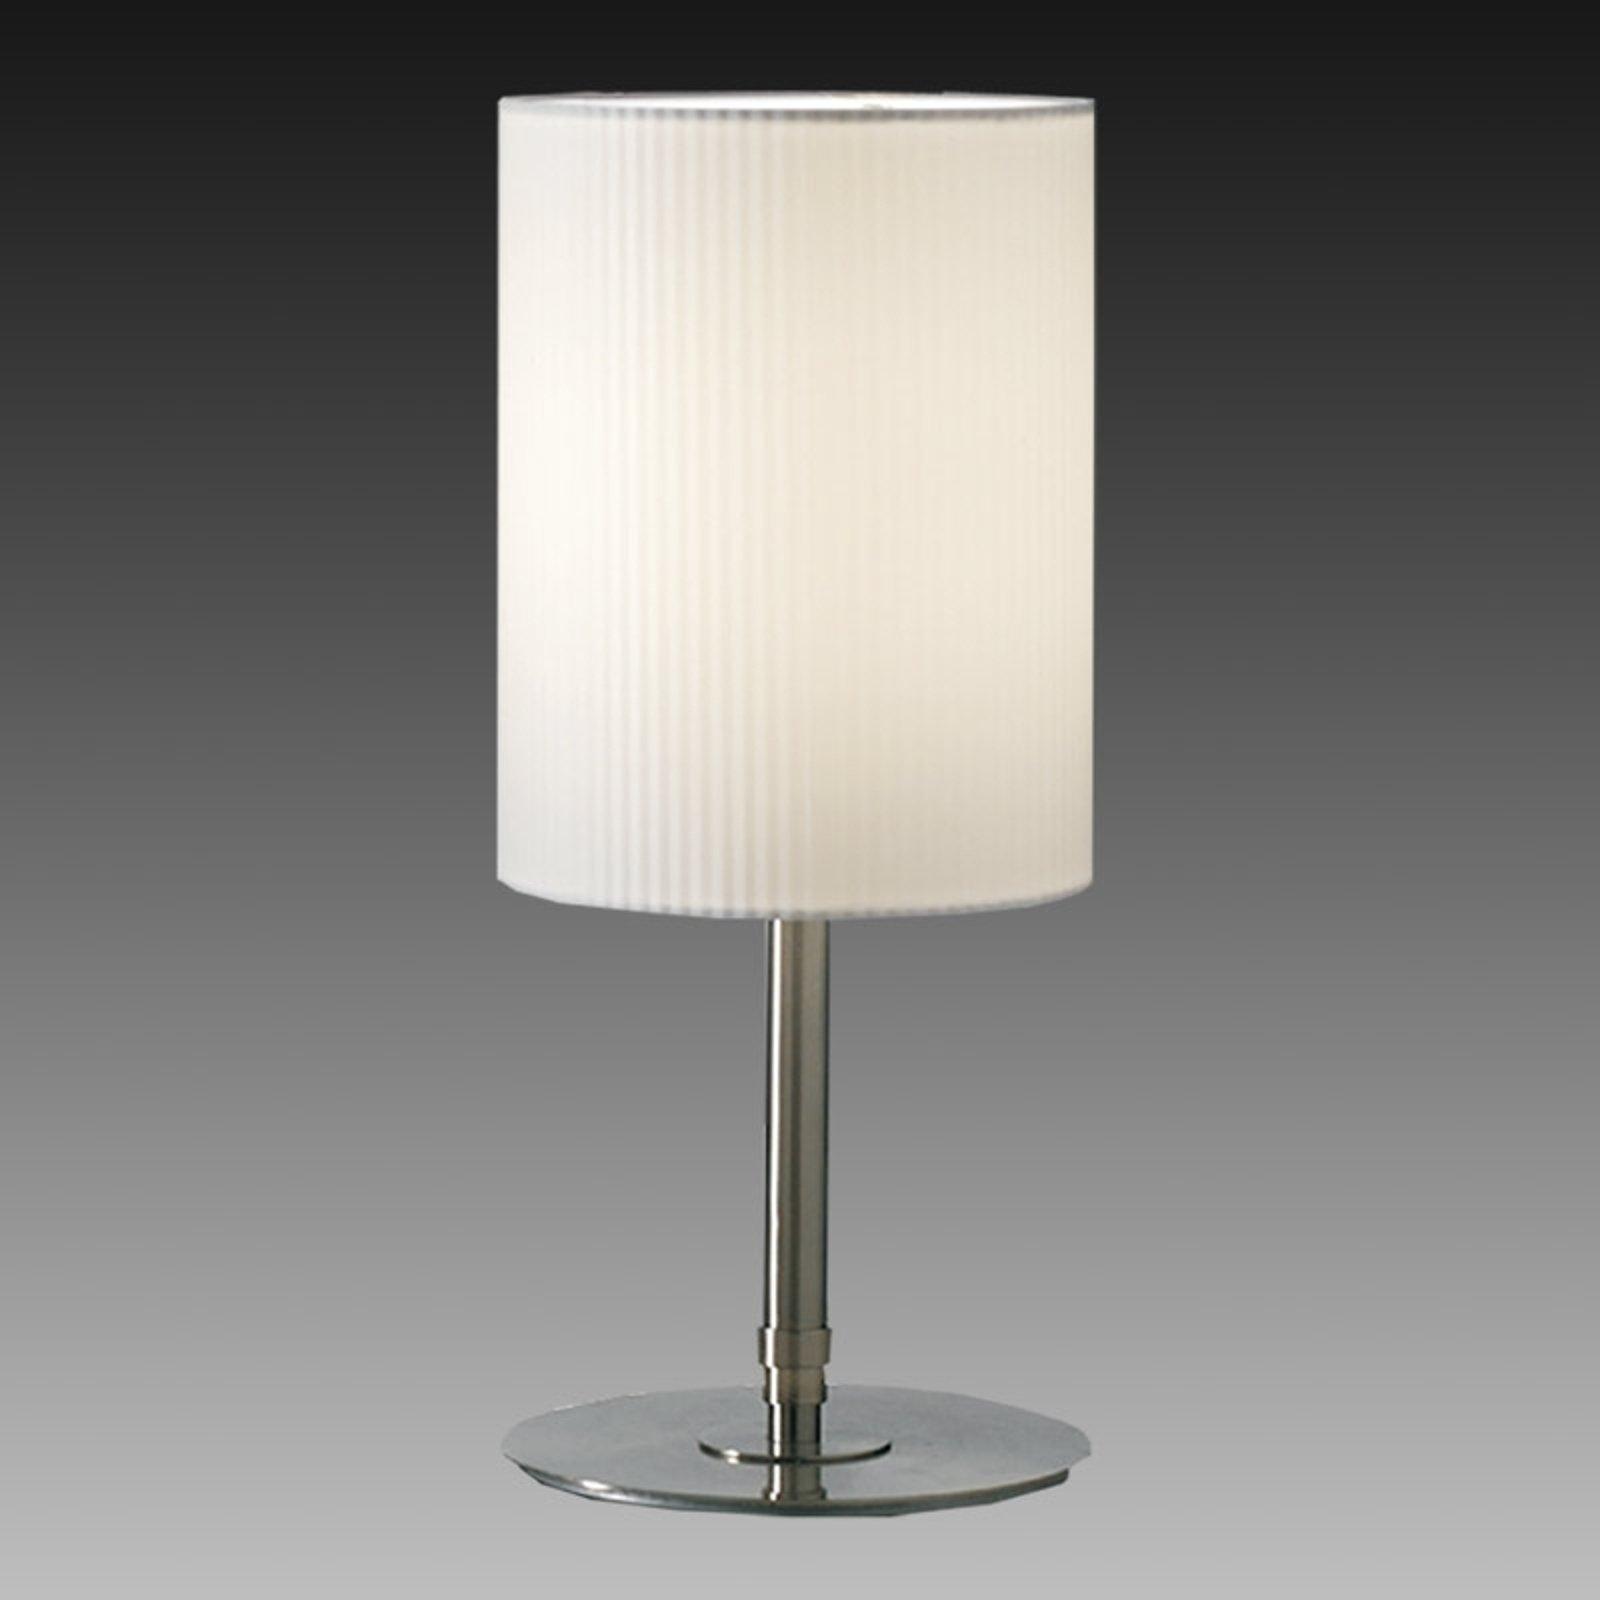 Stemningsfull bordlampe Benito 40 cm